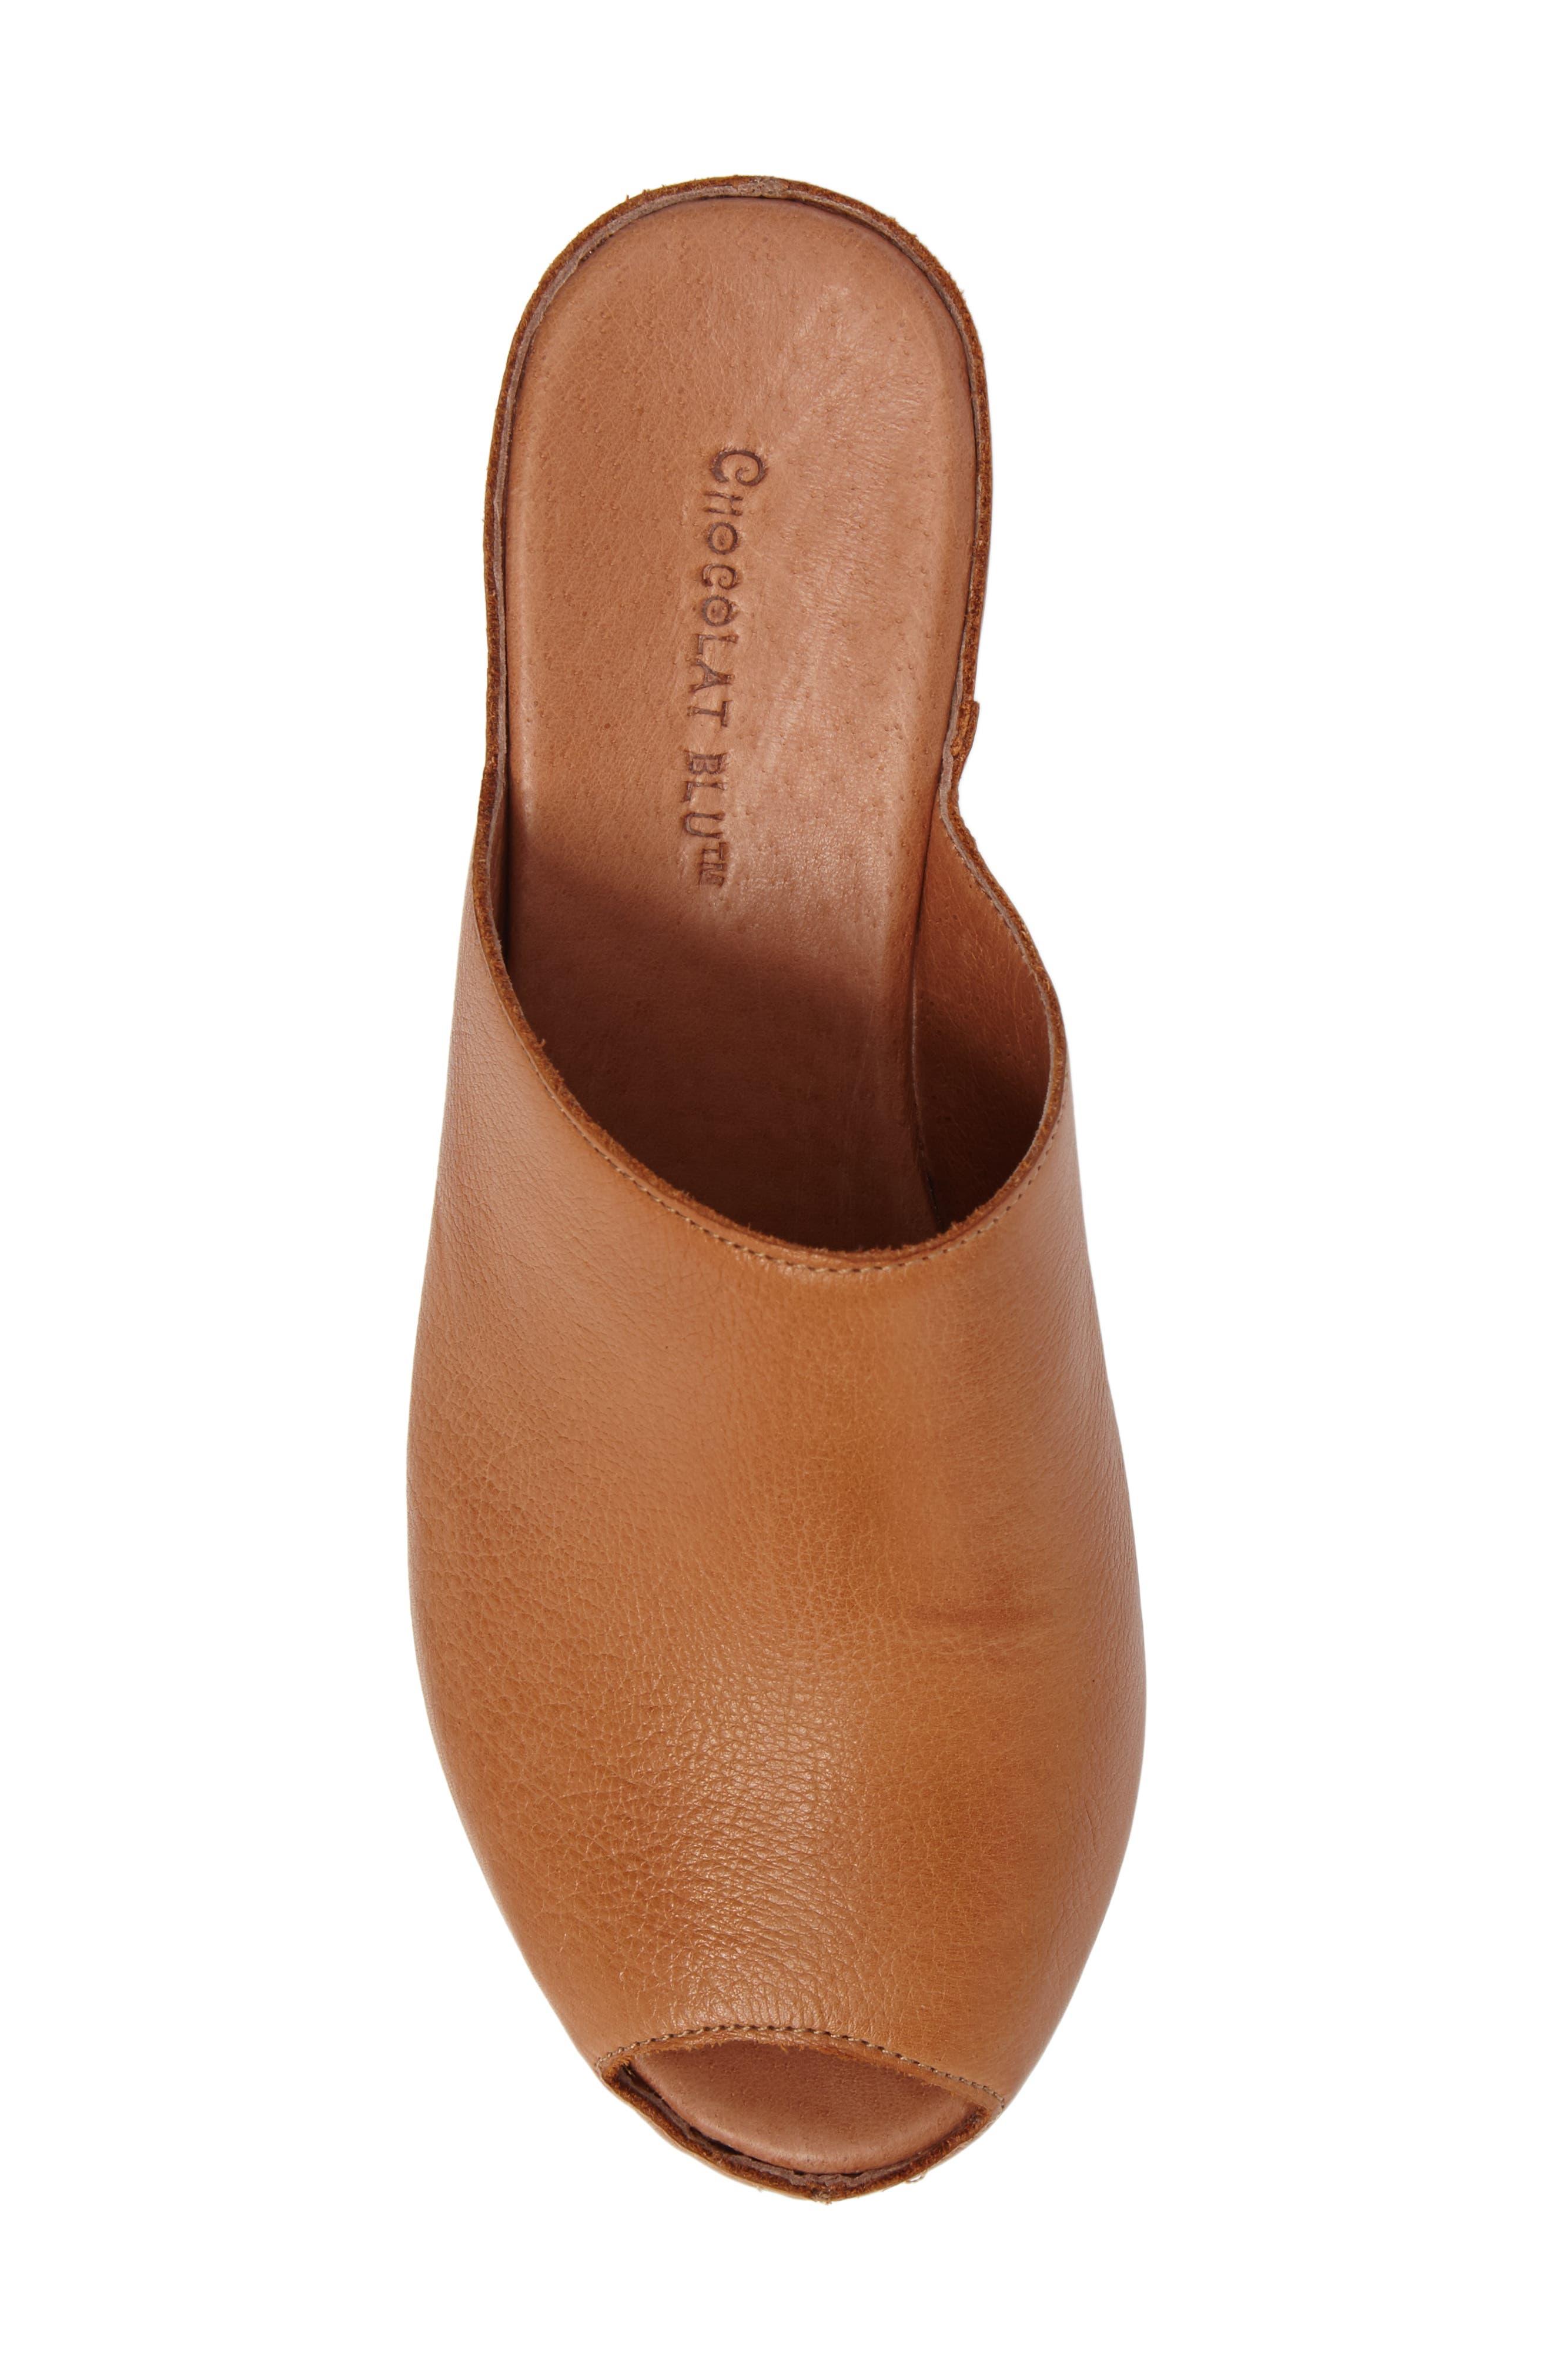 Willa Platform Wedge Mule,                             Alternate thumbnail 5, color,                             Camel Leather